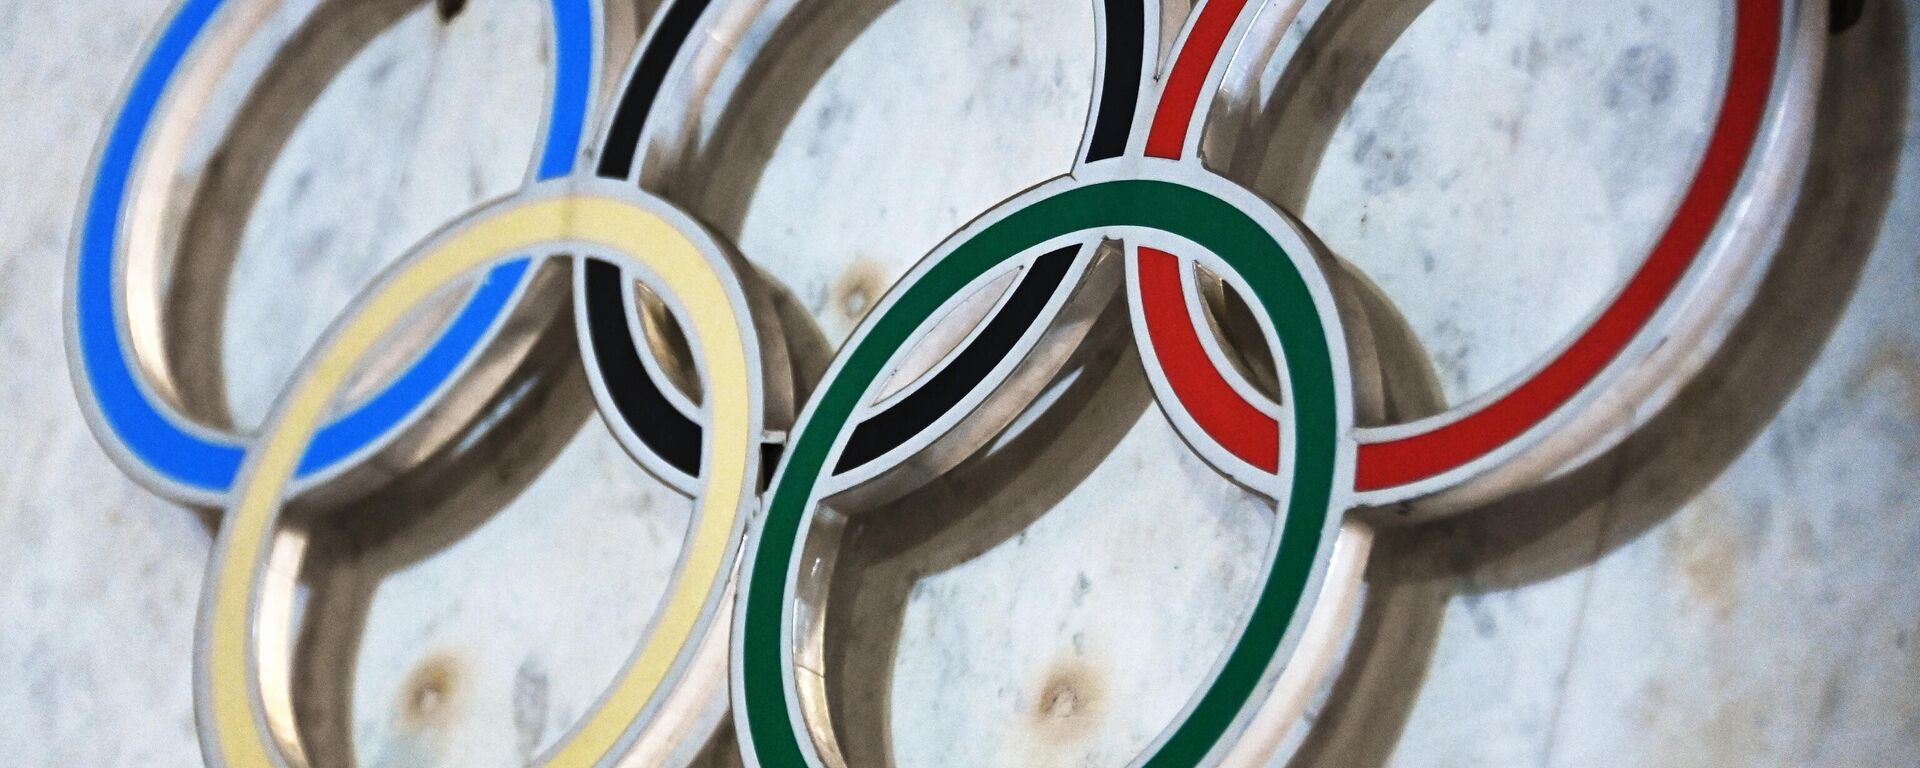 Olympische Ringe (Symbolbild) - SNA, 1920, 14.07.2021